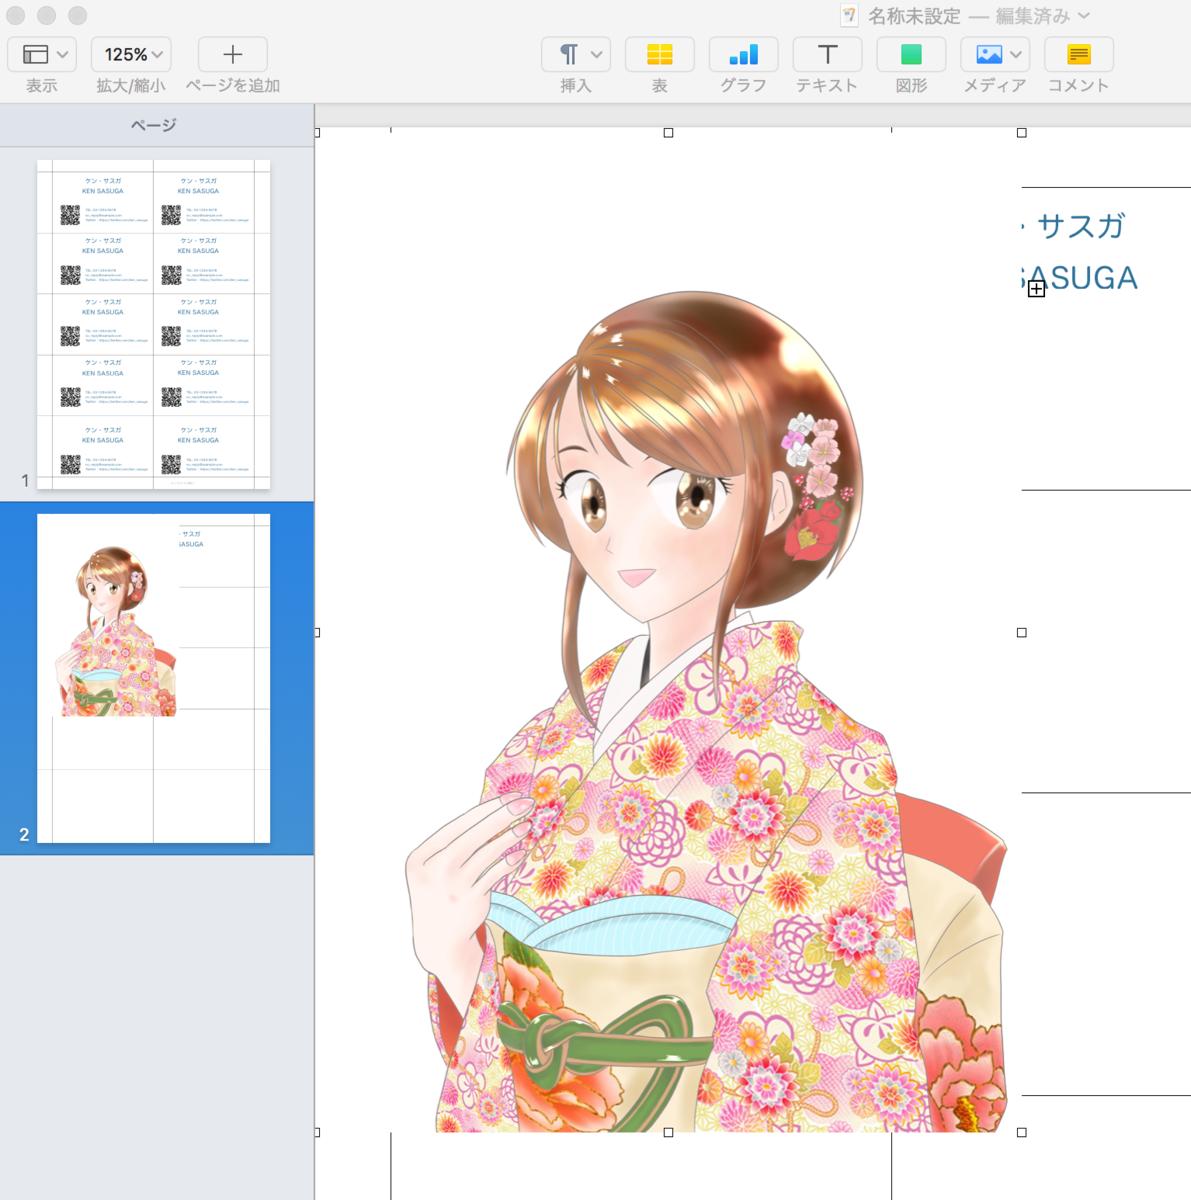 f:id:kensasuga2018:20200303203226p:plain